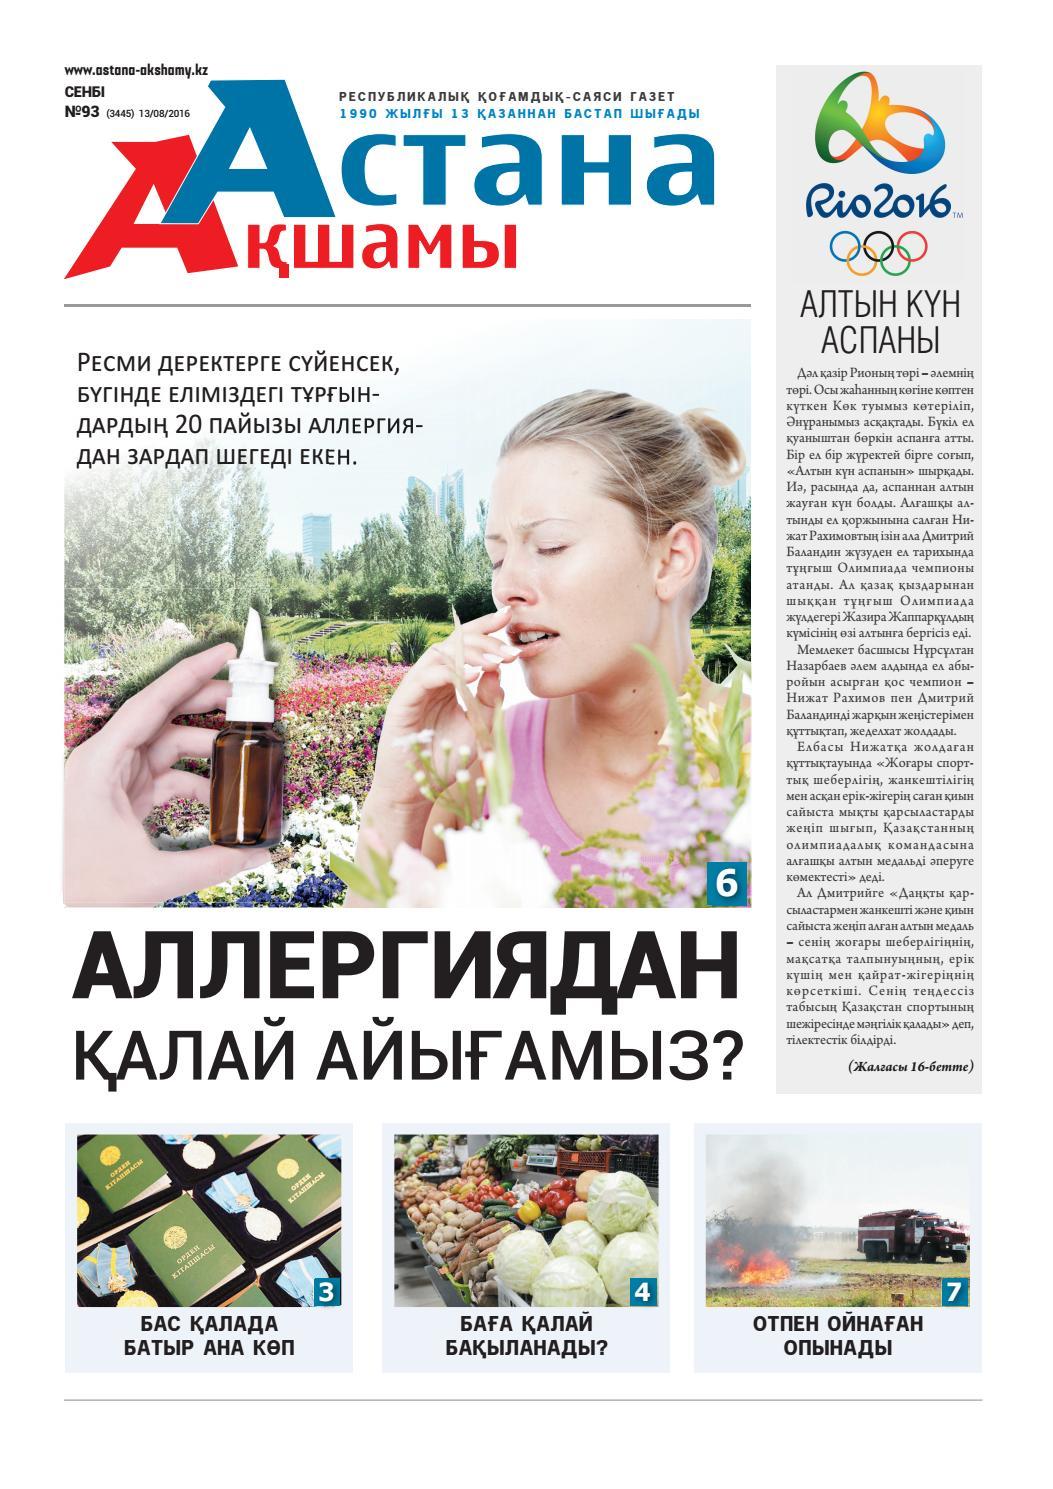 Онлайн слоттар украина